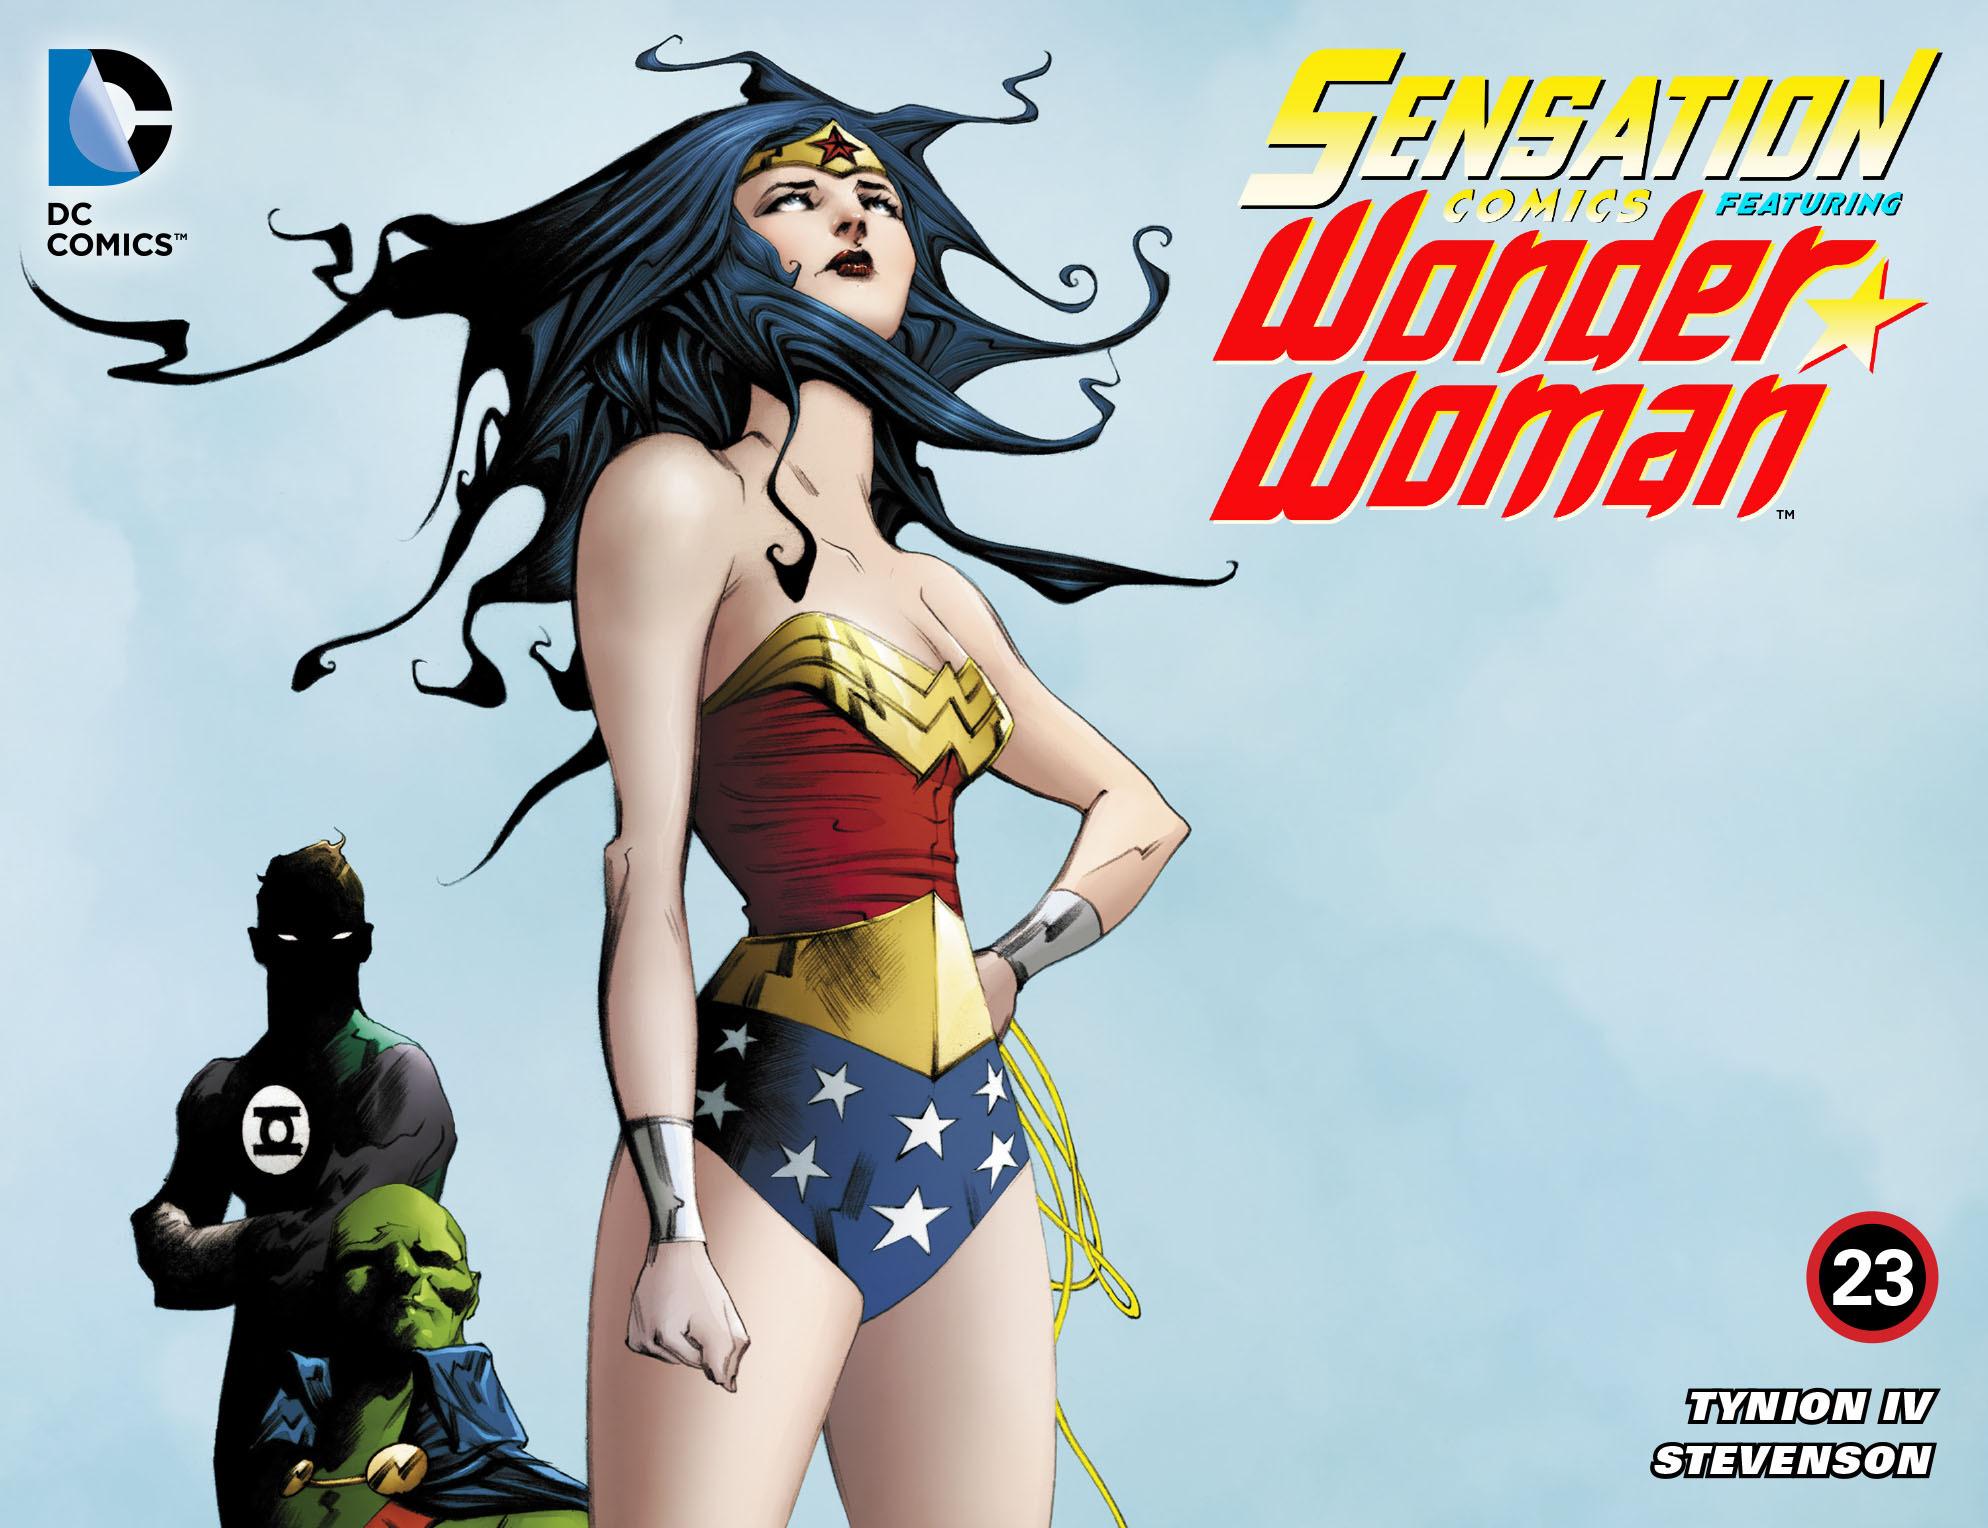 Read online Sensation Comics Featuring Wonder Woman comic -  Issue #23 - 1